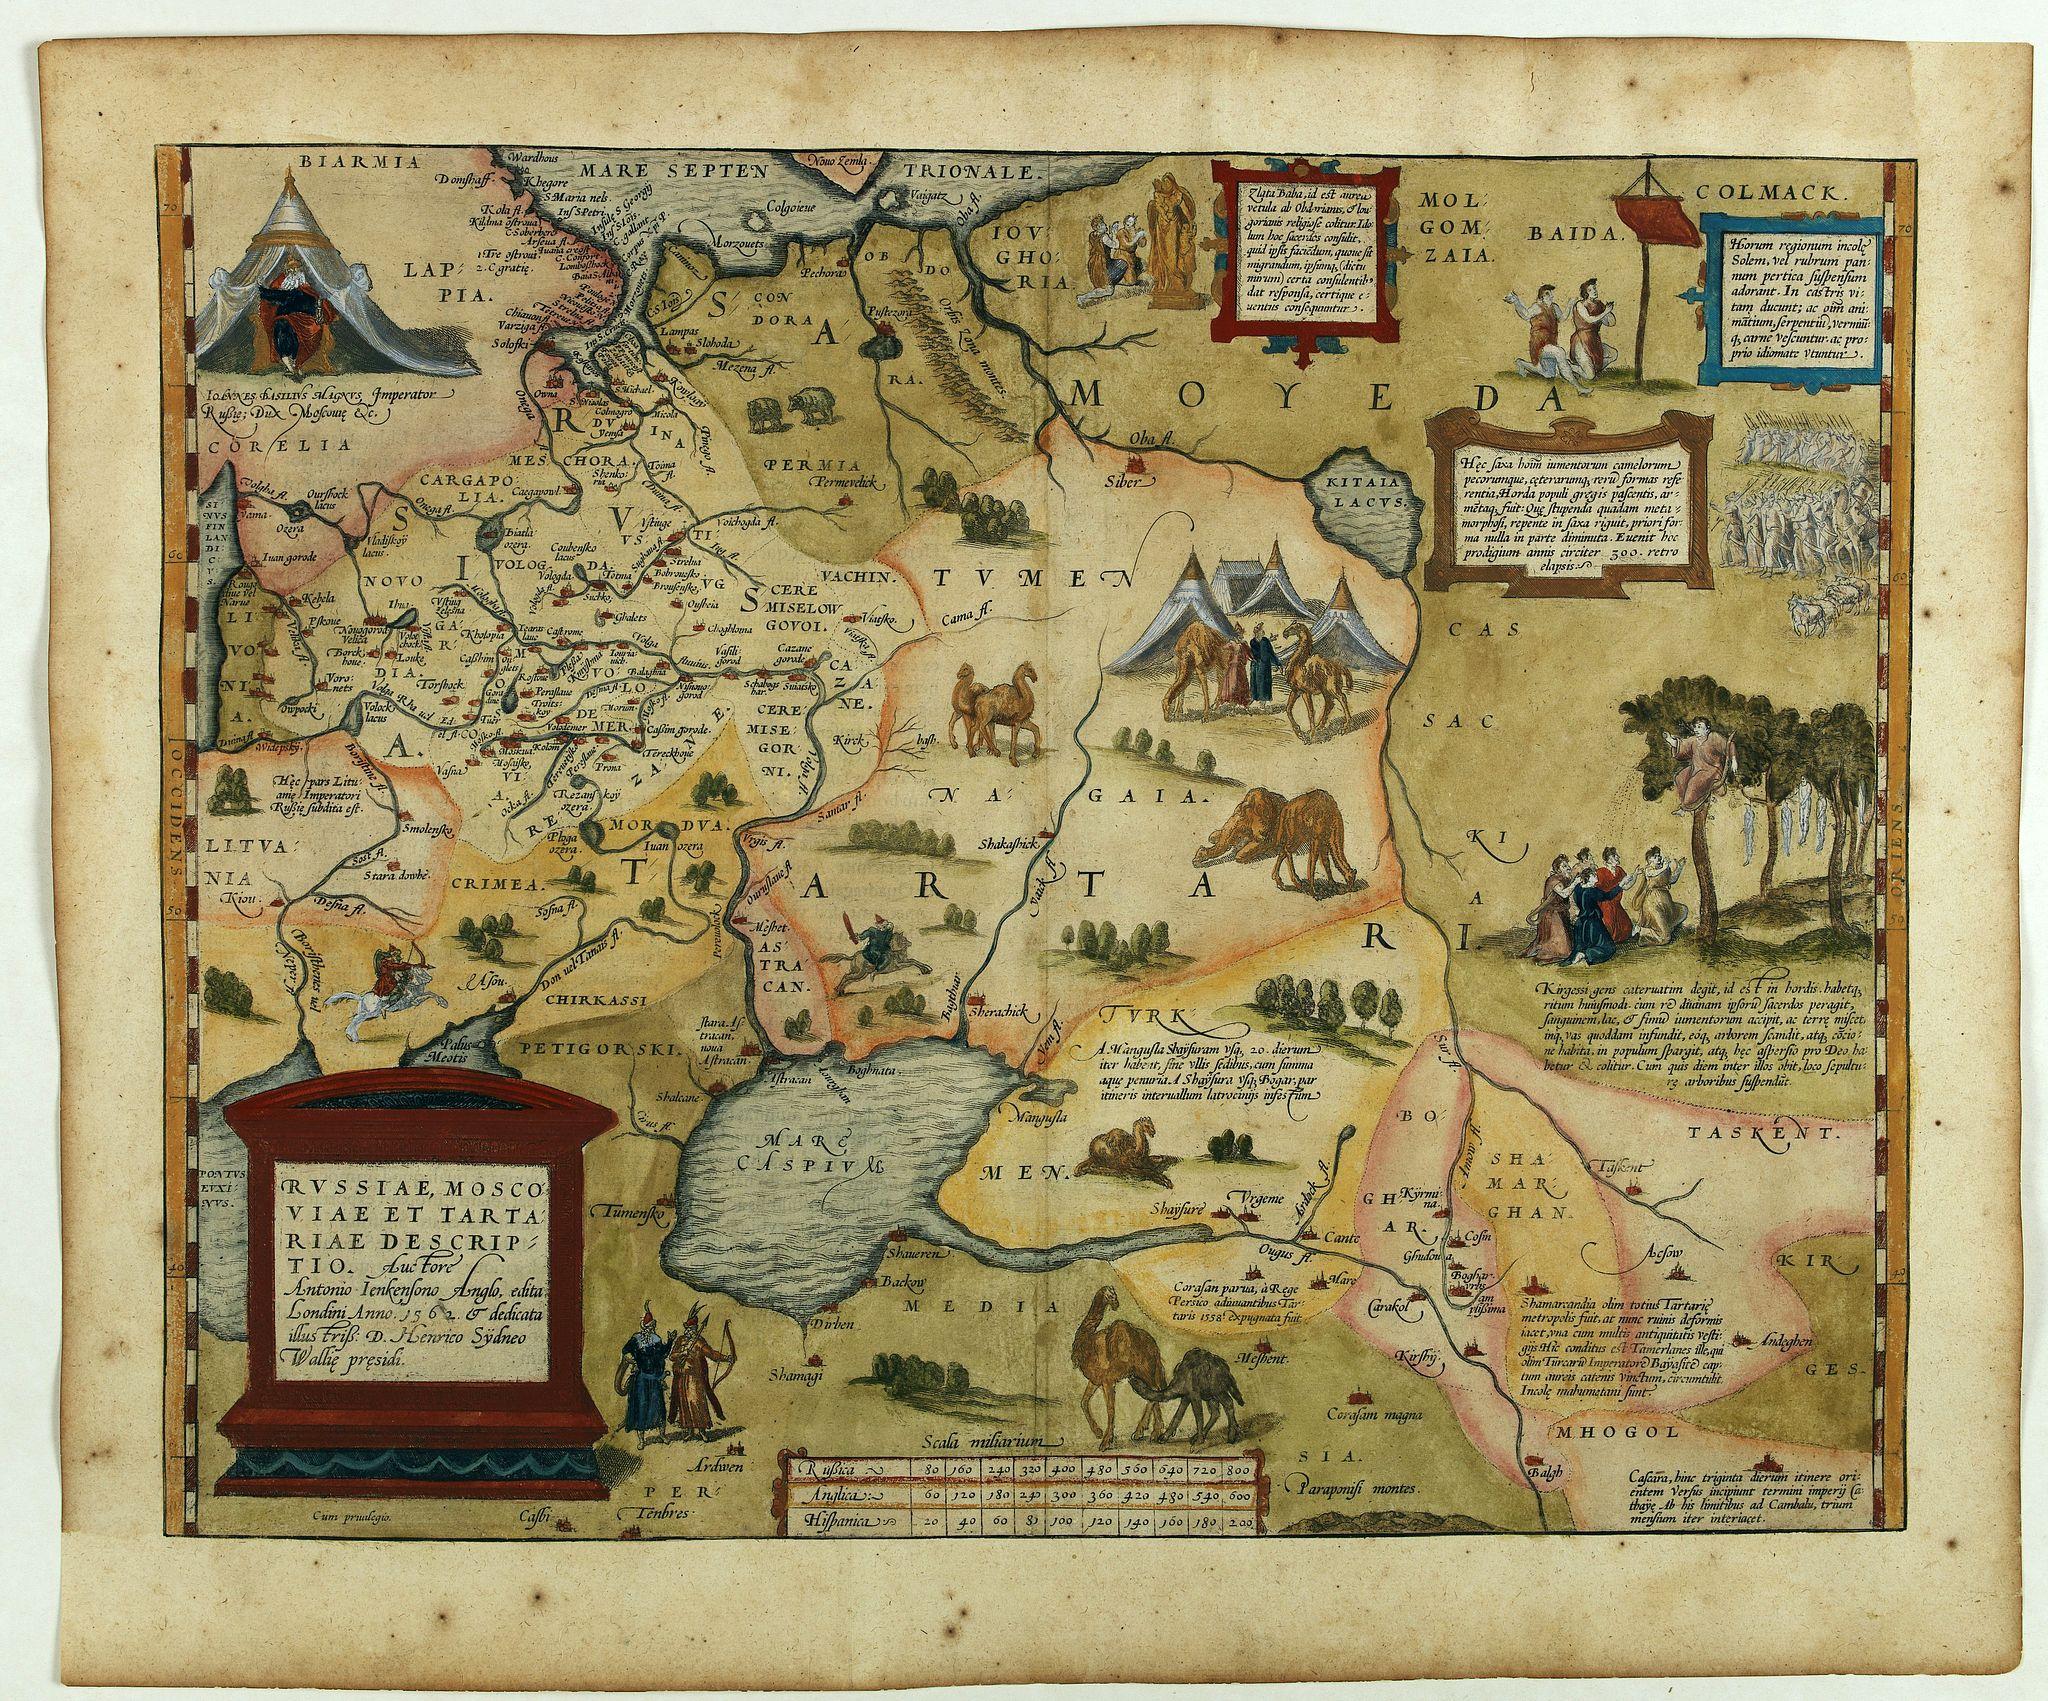 ORTELIUS, A. -  Russiae, Moscoviae et Tartariae Descriptio. [With Latin text on verso]